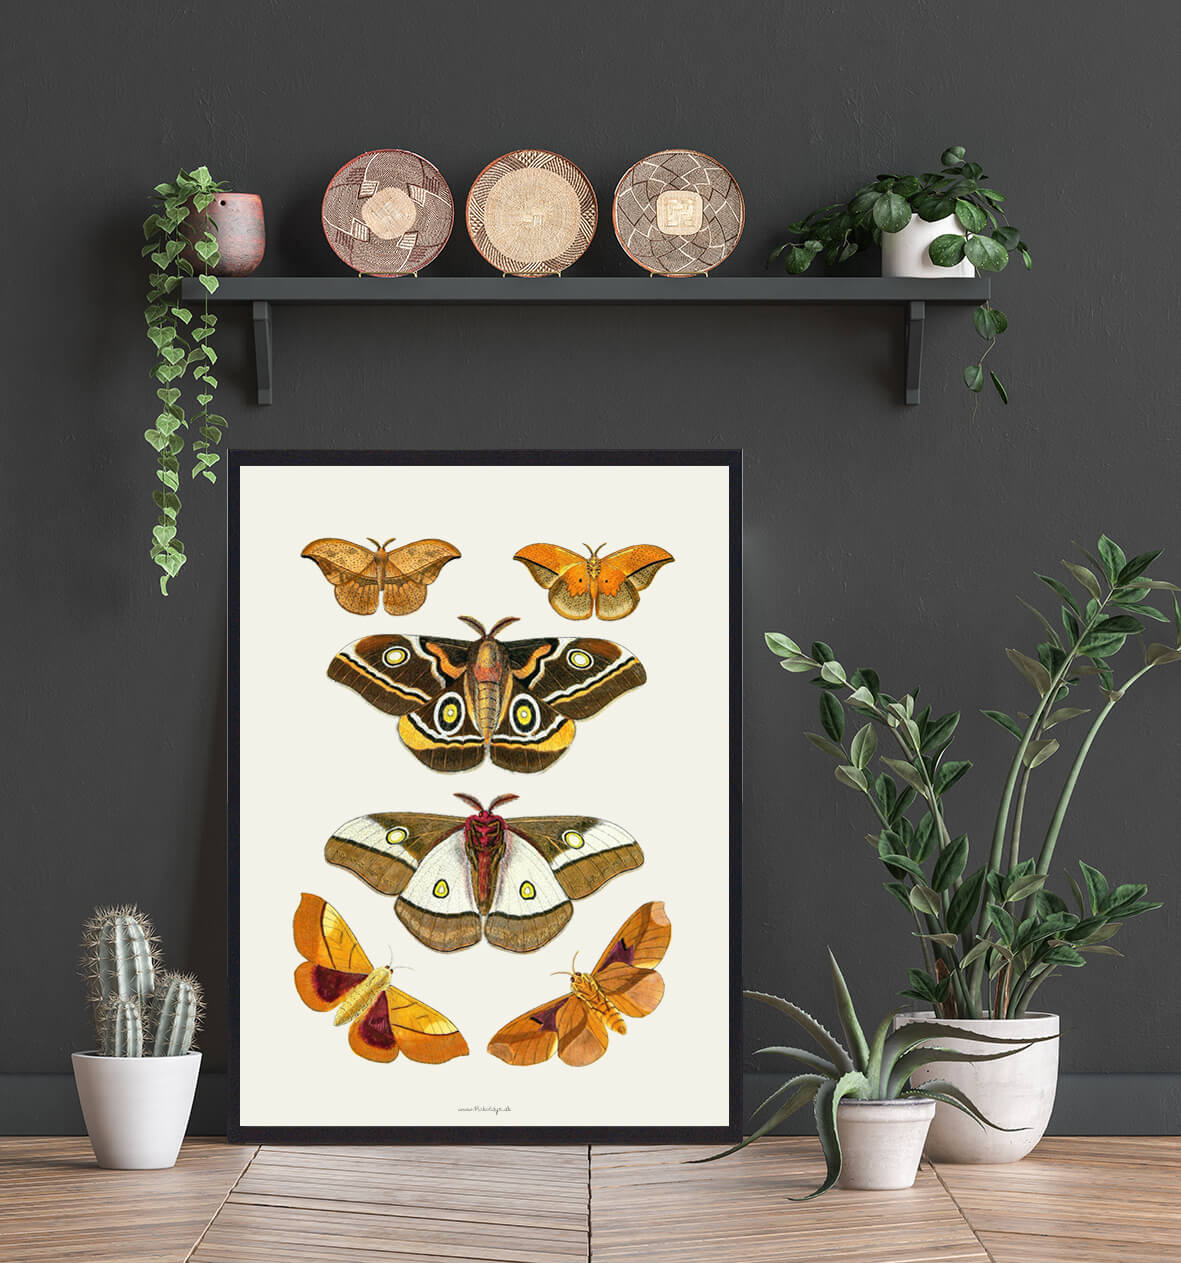 sommerfugle-plakater-boligindretning-3